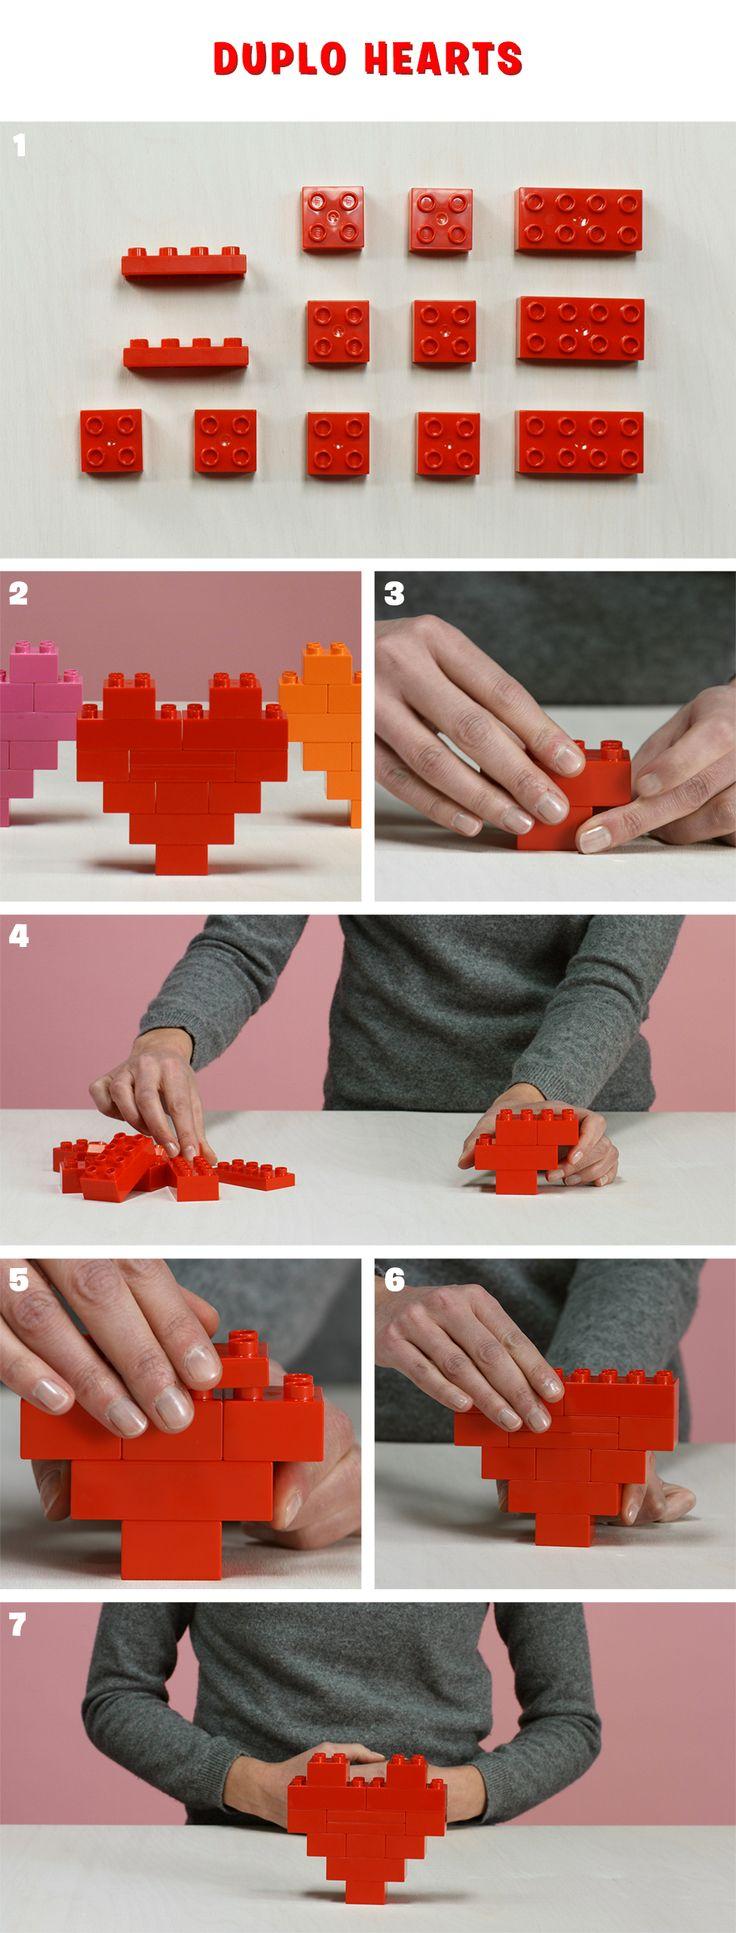 LEGO® DUPLO® Valentine's Day decorations